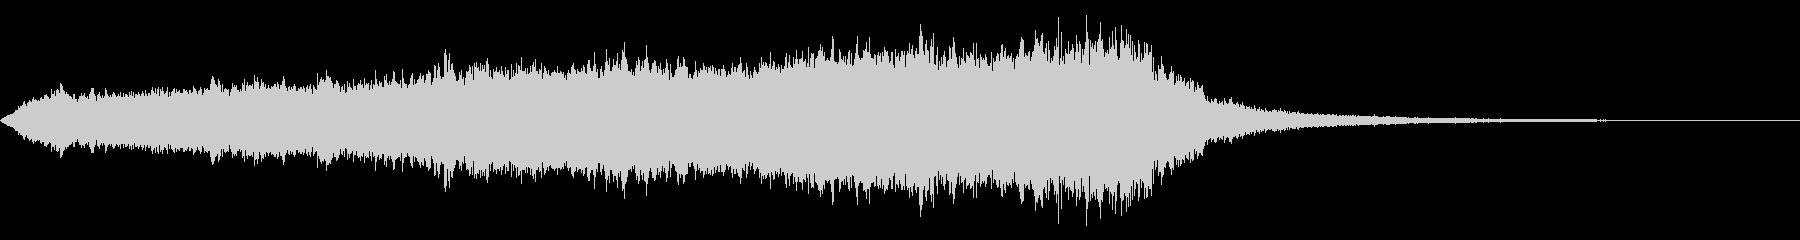 CINEMATIC RISER_19の未再生の波形